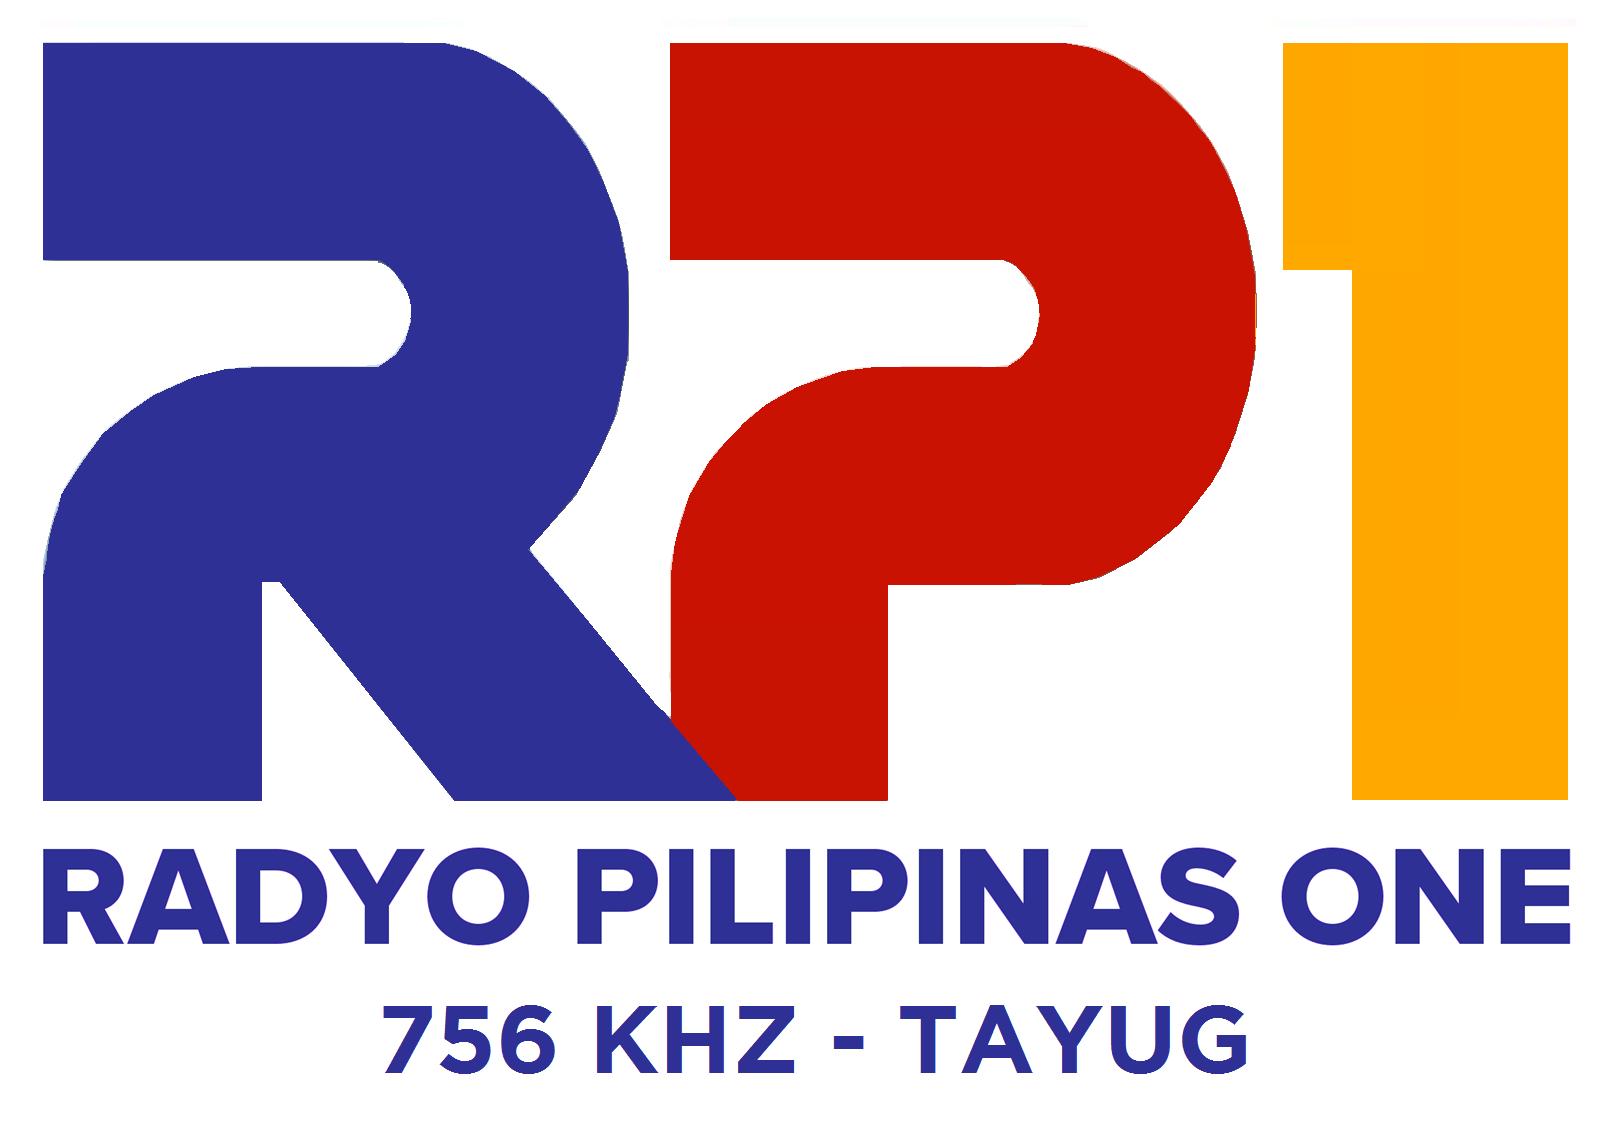 RP1 TAYUG.png